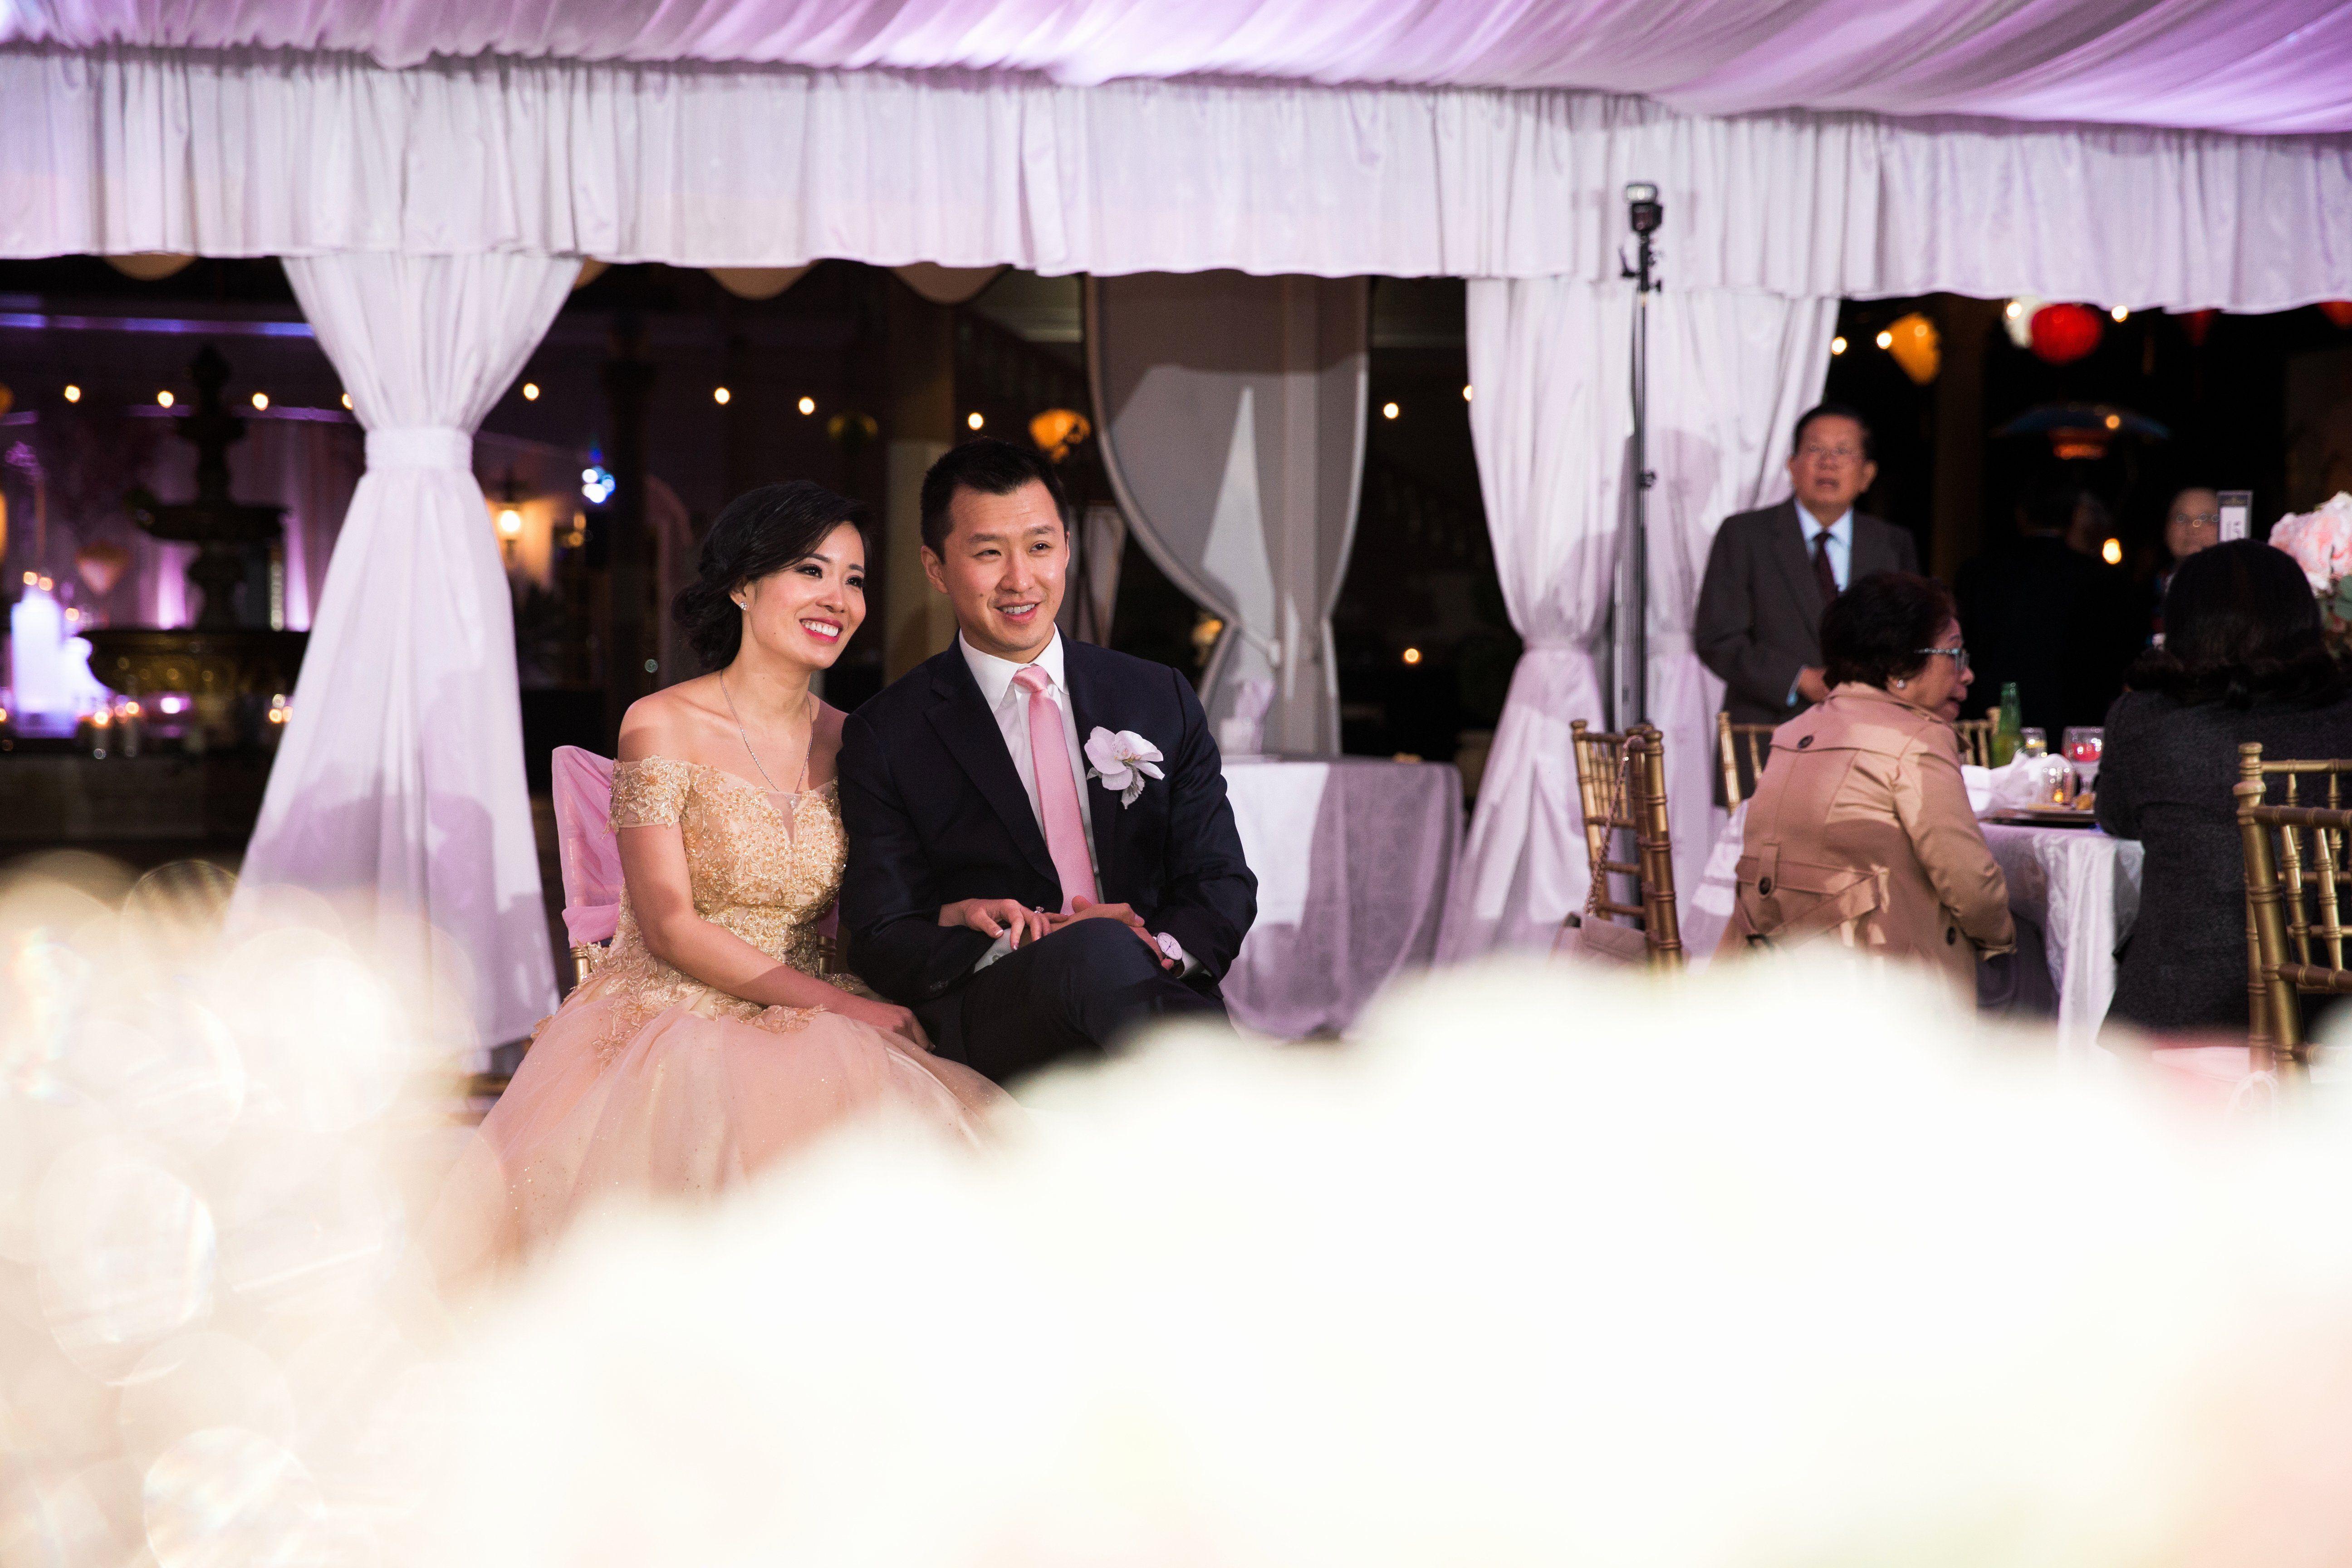 Sold David S Bridal Galina Wedding Dress 22w In 2020 Davids Bridal Galina Wedding Dress Davids Bridal Wedding Dresses